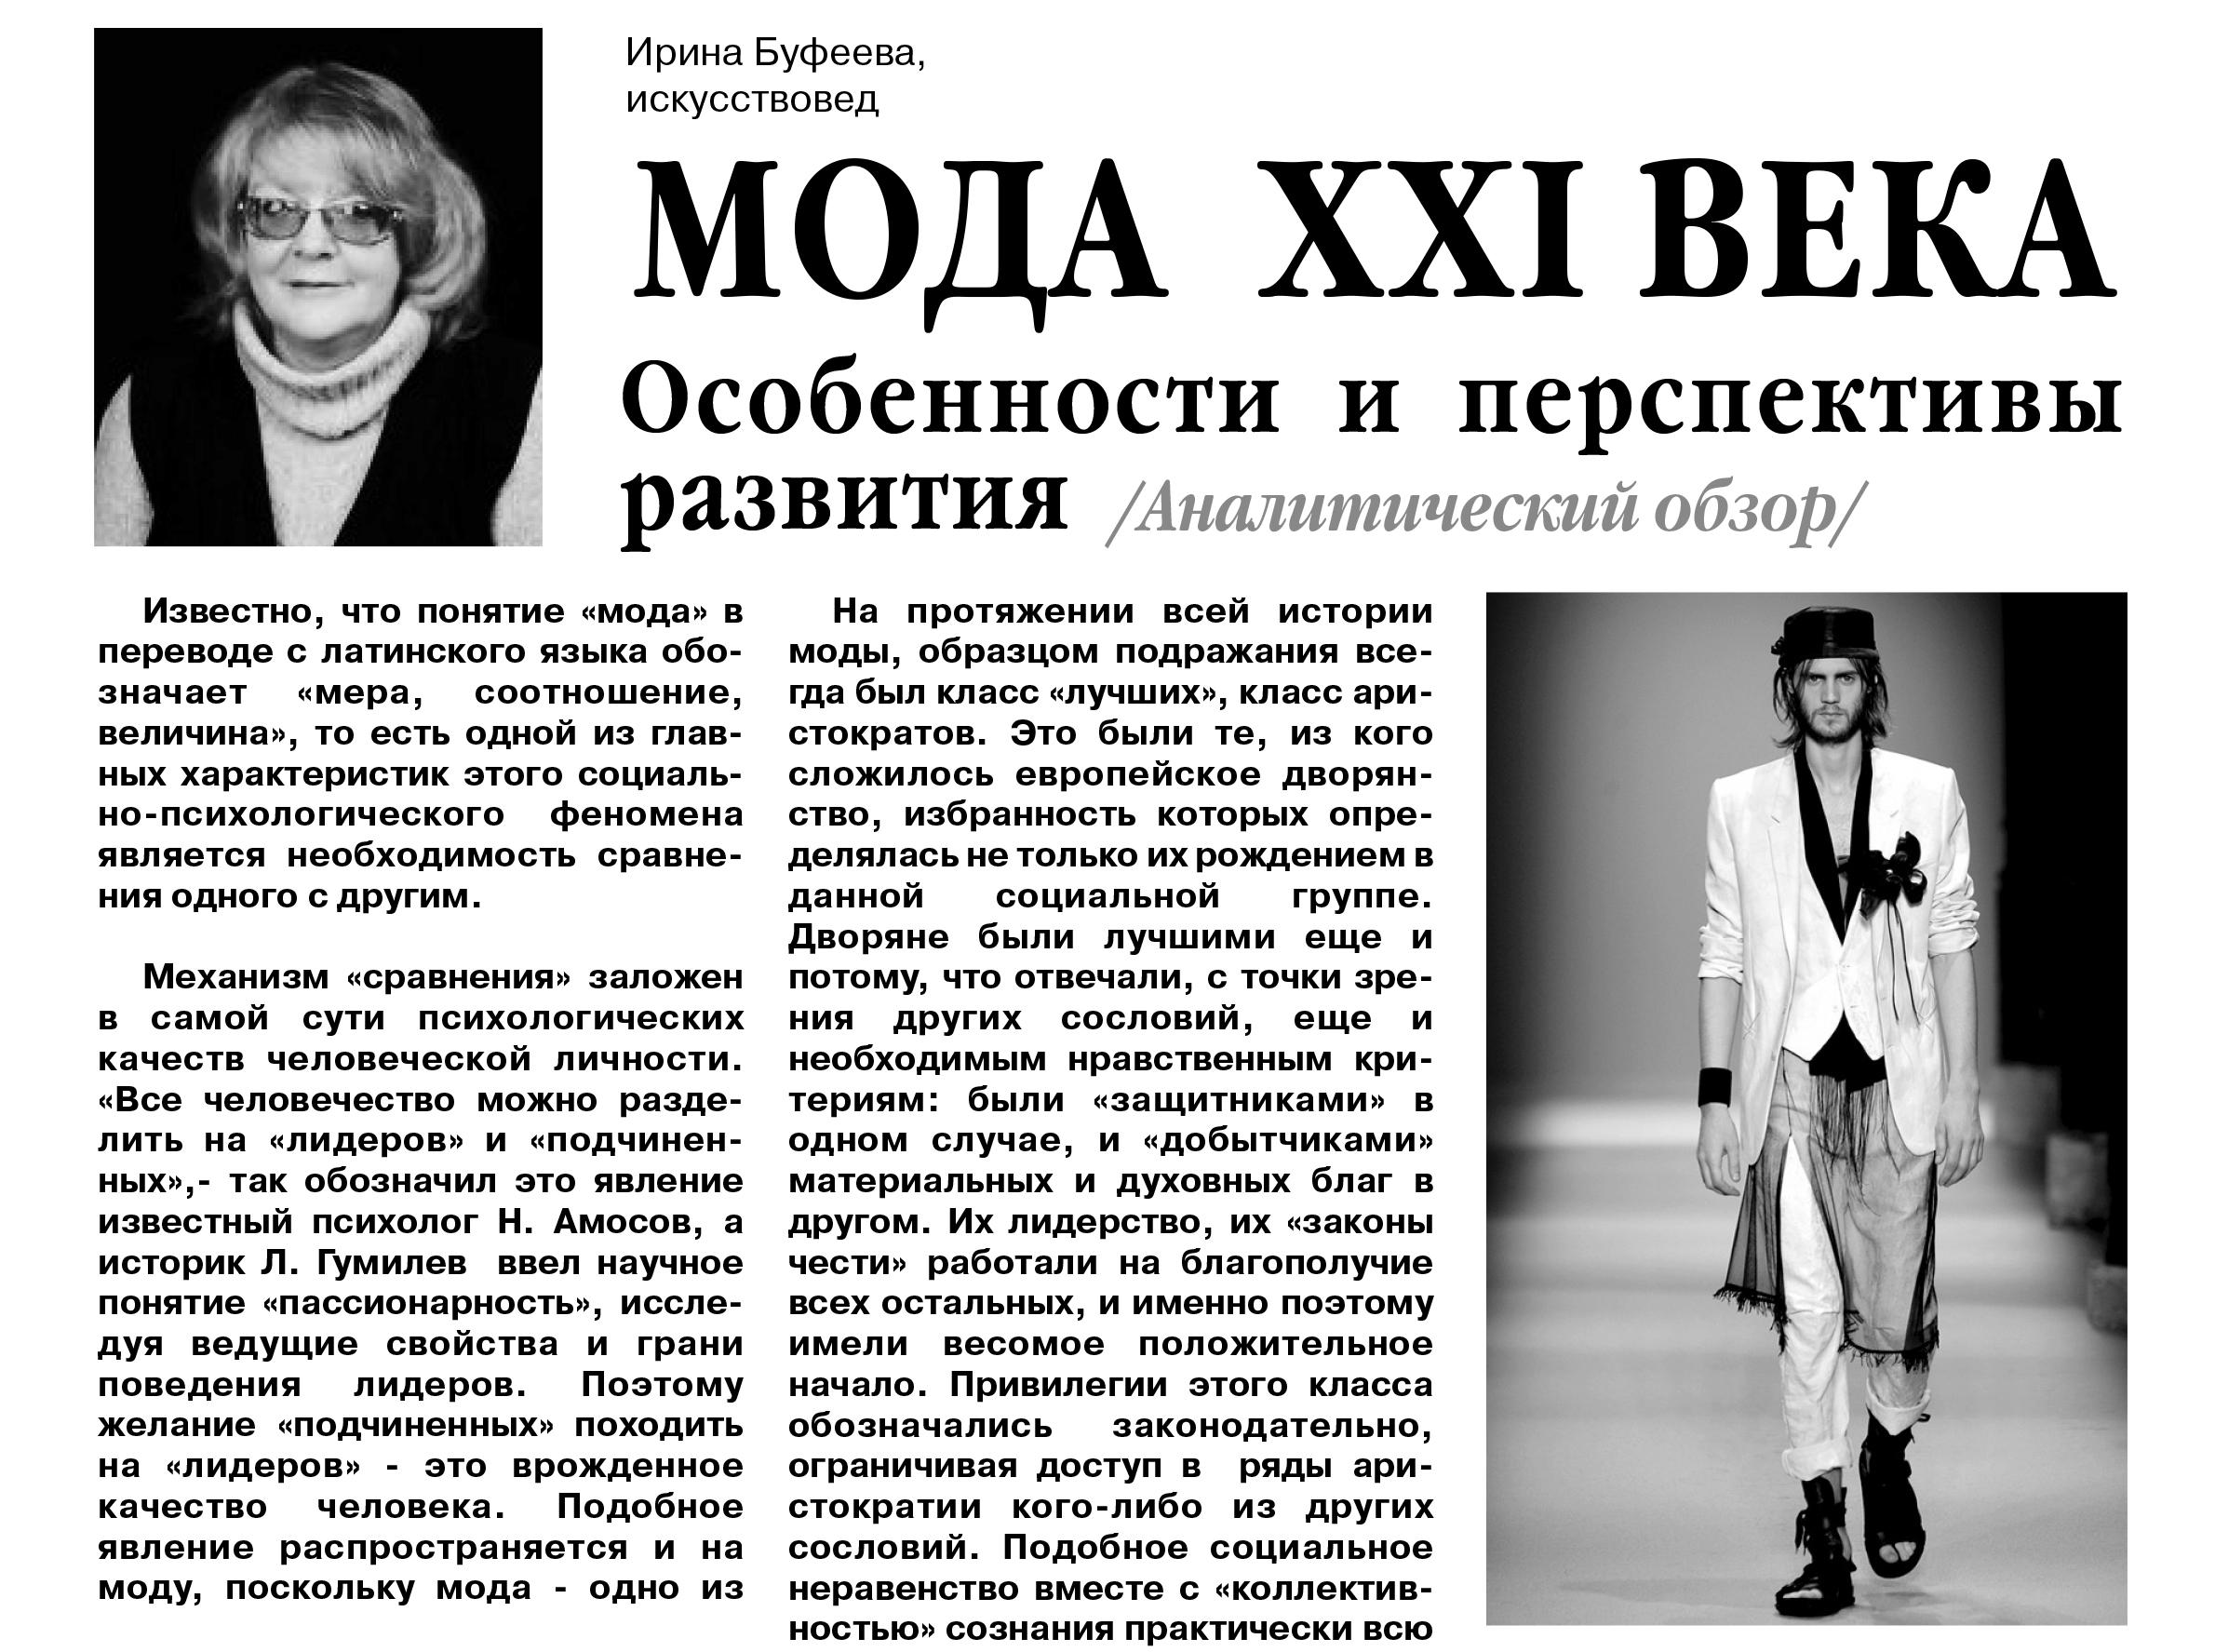 Photo of Игра в жмурки: XXI век и новый максимализм мода 21 века Игра в жмурки: XXI век и новый максимализм 29 10 1